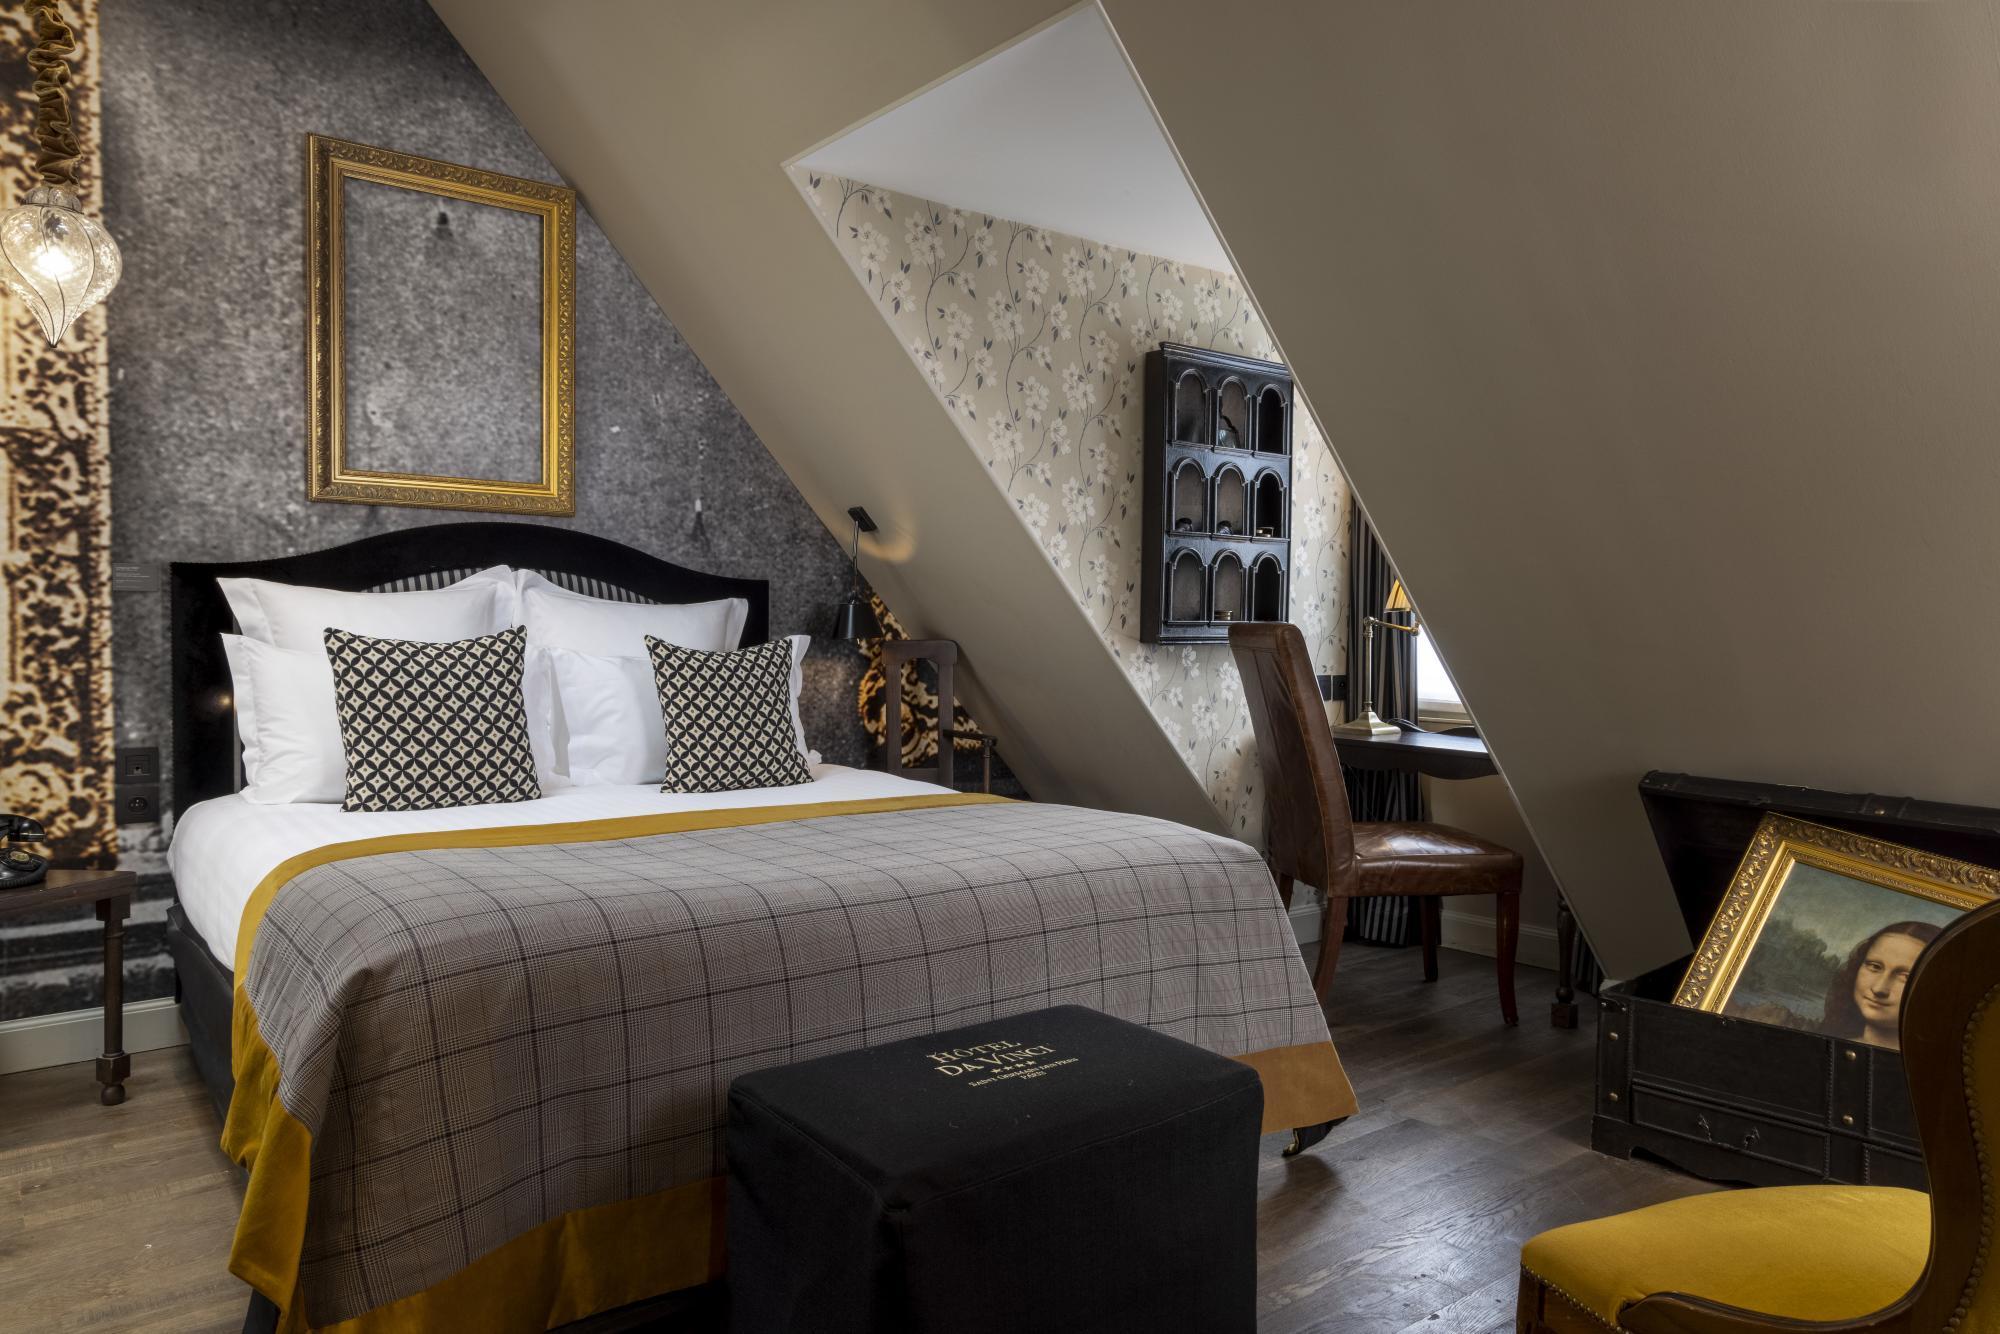 Hotel Da Vinci Adorateur Room